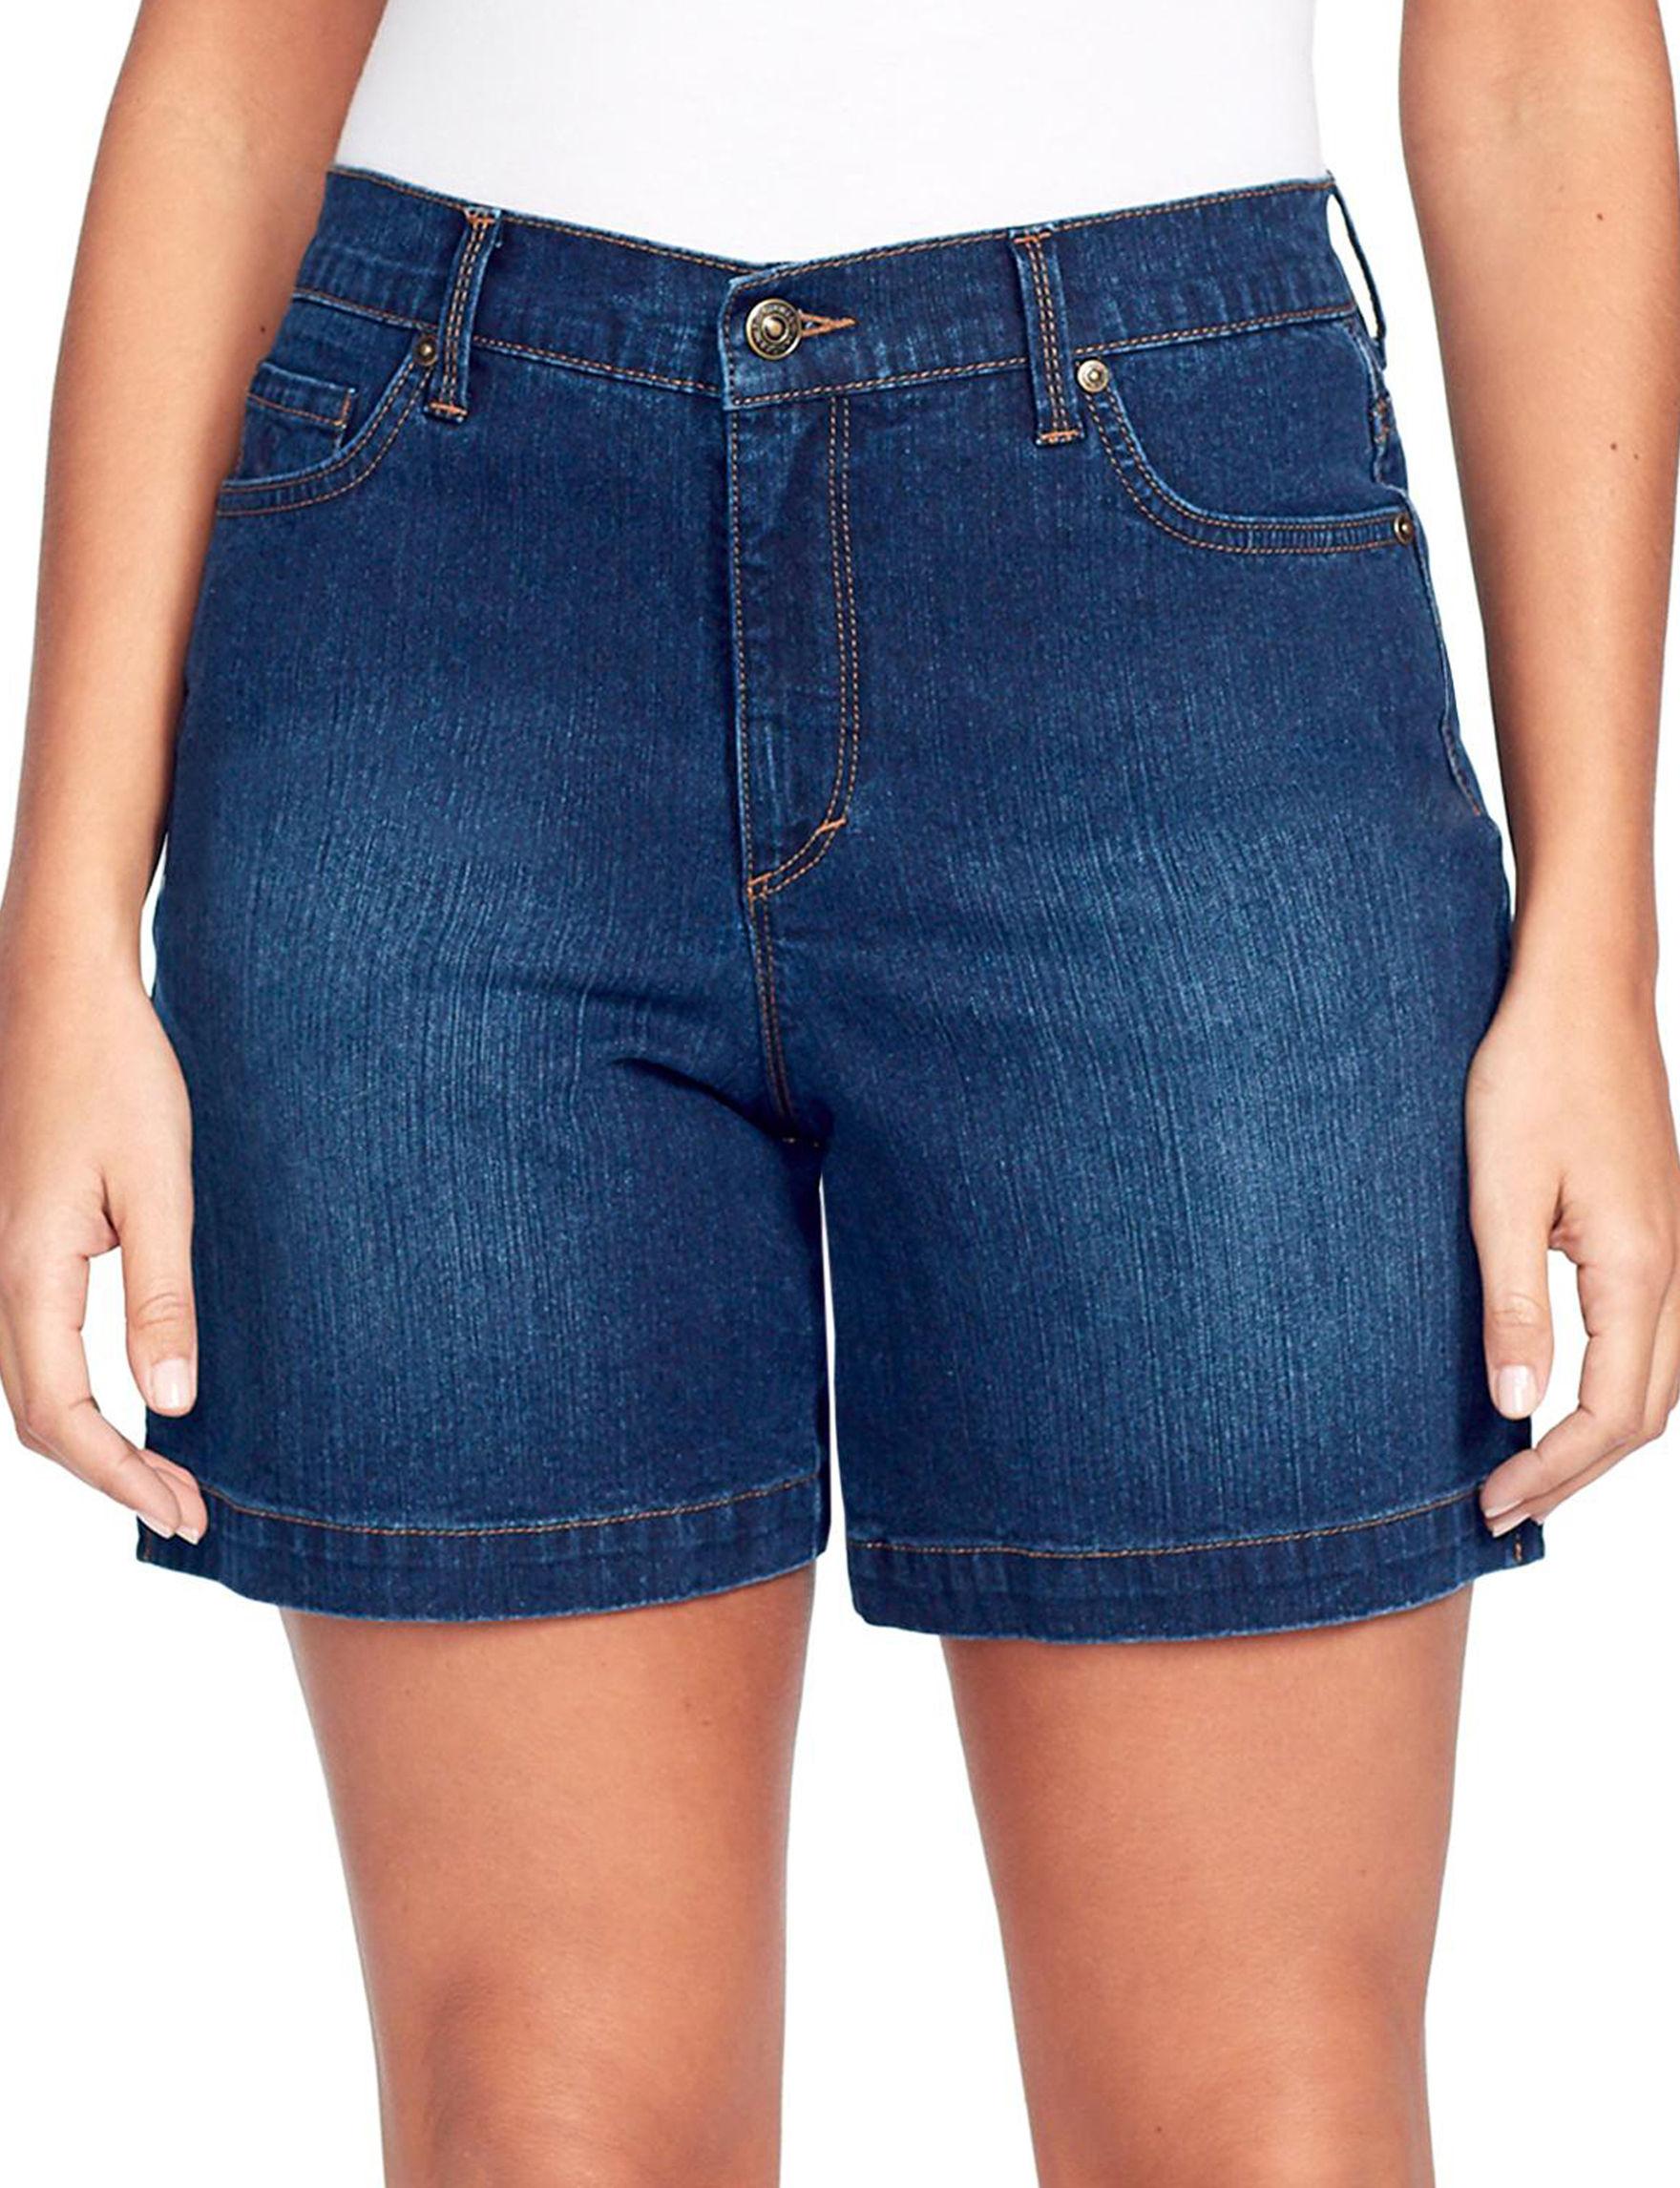 Gloria Vanderbilt Blue Denim Shorts